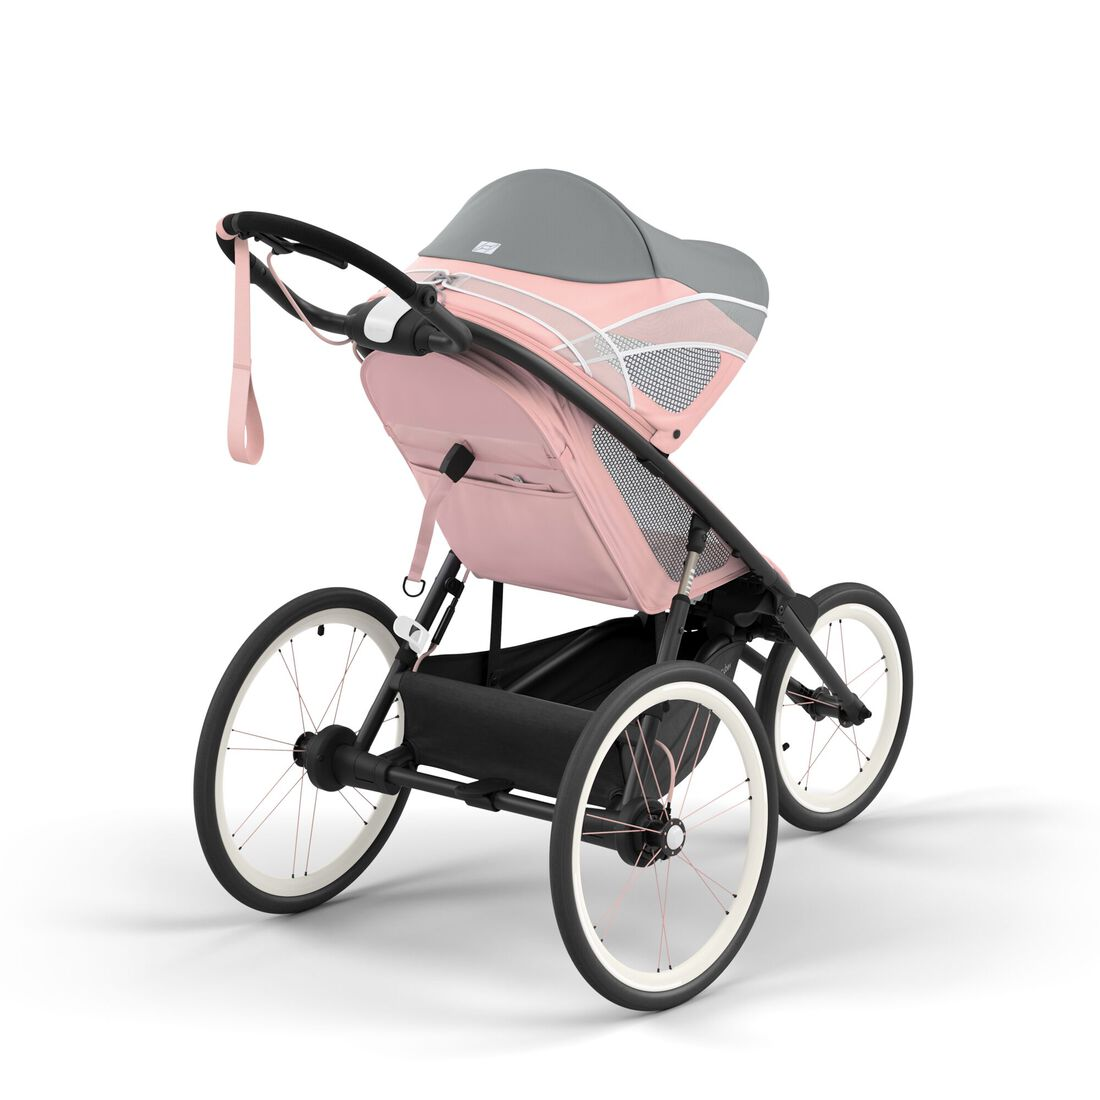 CYBEX Avi Sitzpaket - Silver Pink in Silver Pink large Bild 5